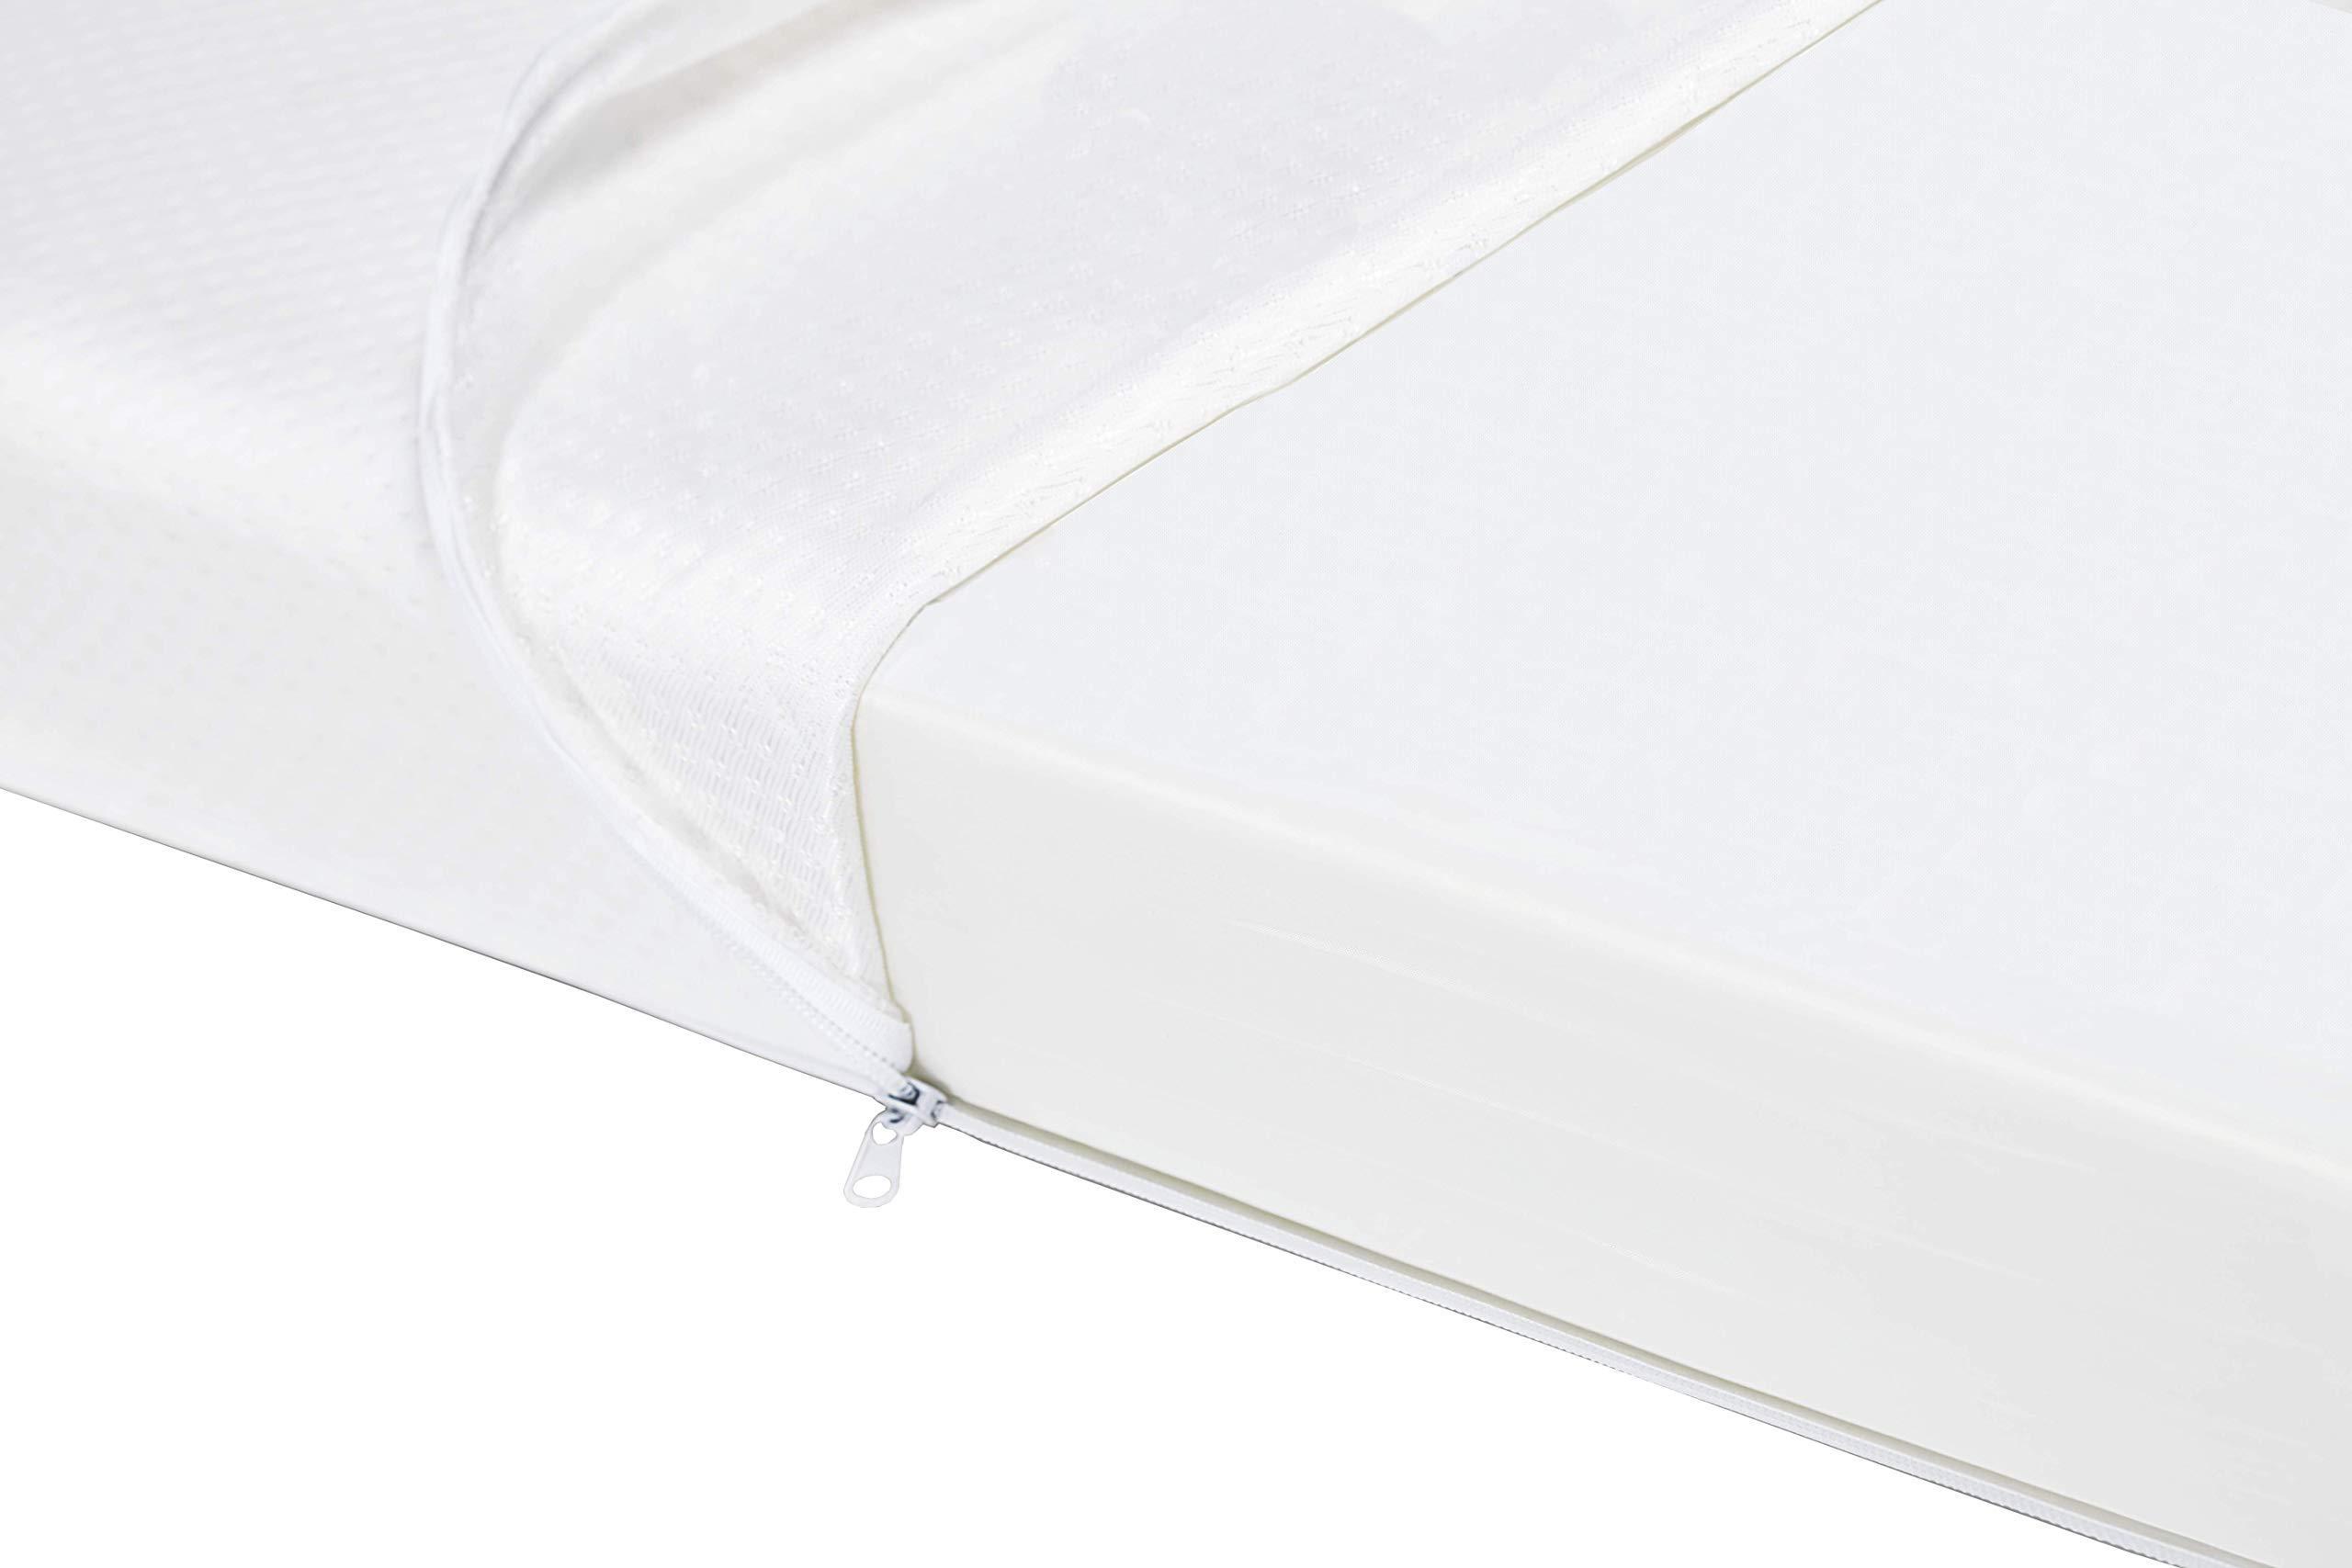 Graco Premium Foam Crib Amp Toddler Bed Mattress Water